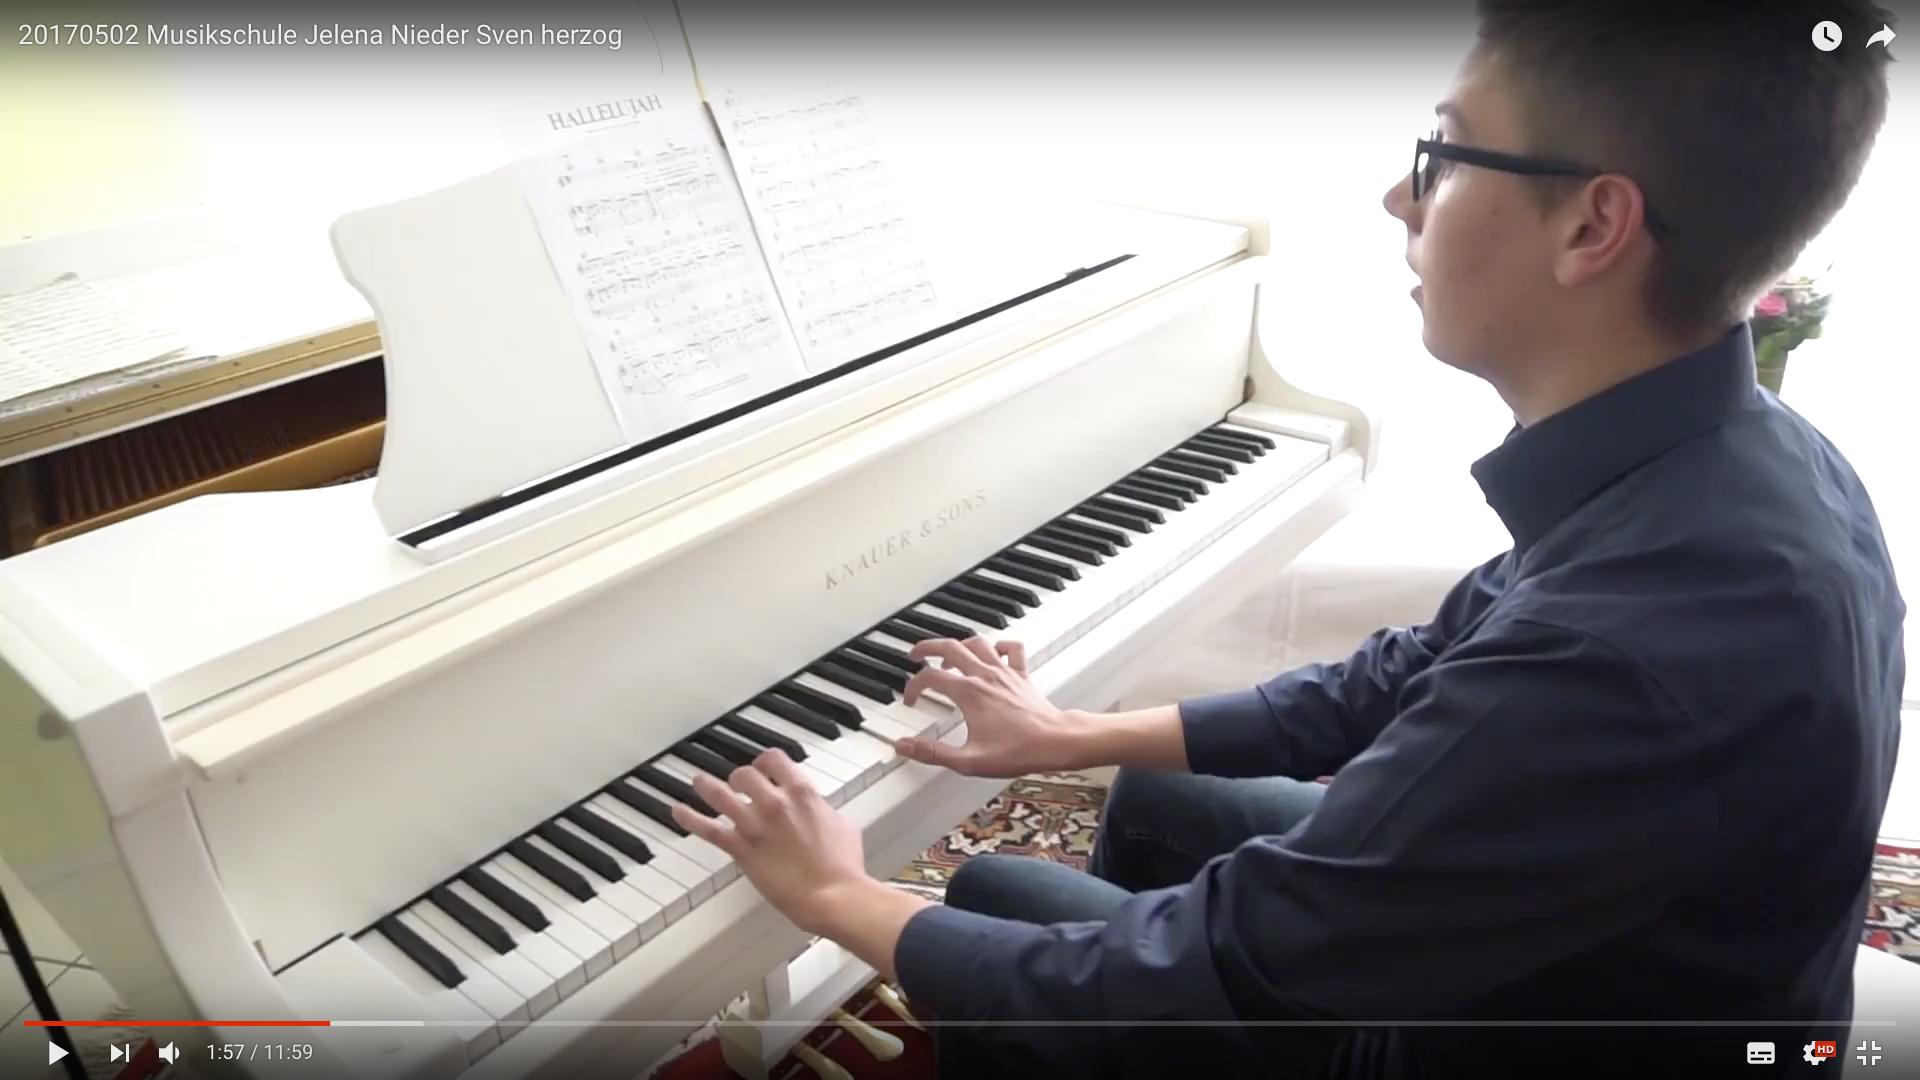 2017 Musikschule Jelena Nieder Klavierunterricht_MSM_MEDIEN_SAAR_MOSEL_SAARLAND_FERNSEHEN_1_ED_SAAR